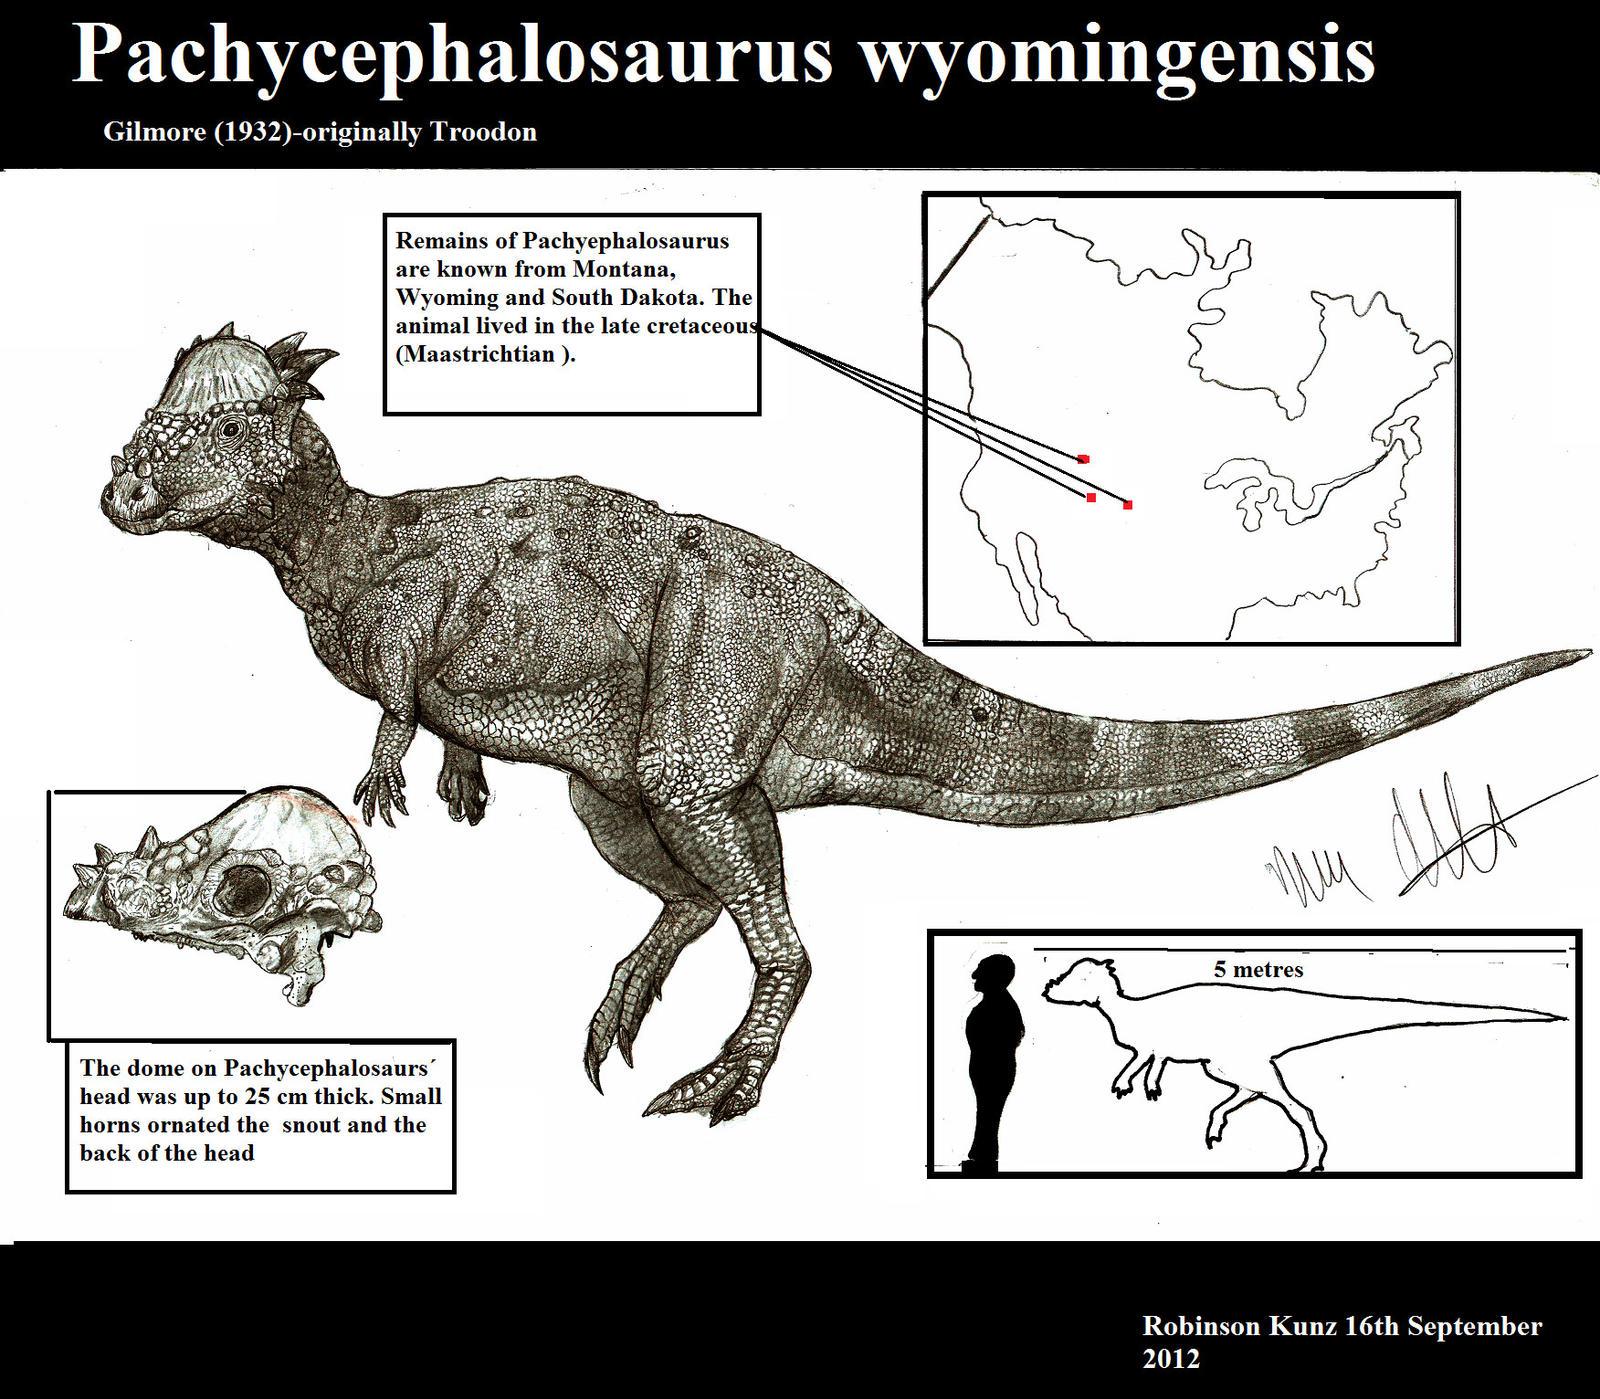 Pachycephalosaurus wyomingensis by Teratophoneus